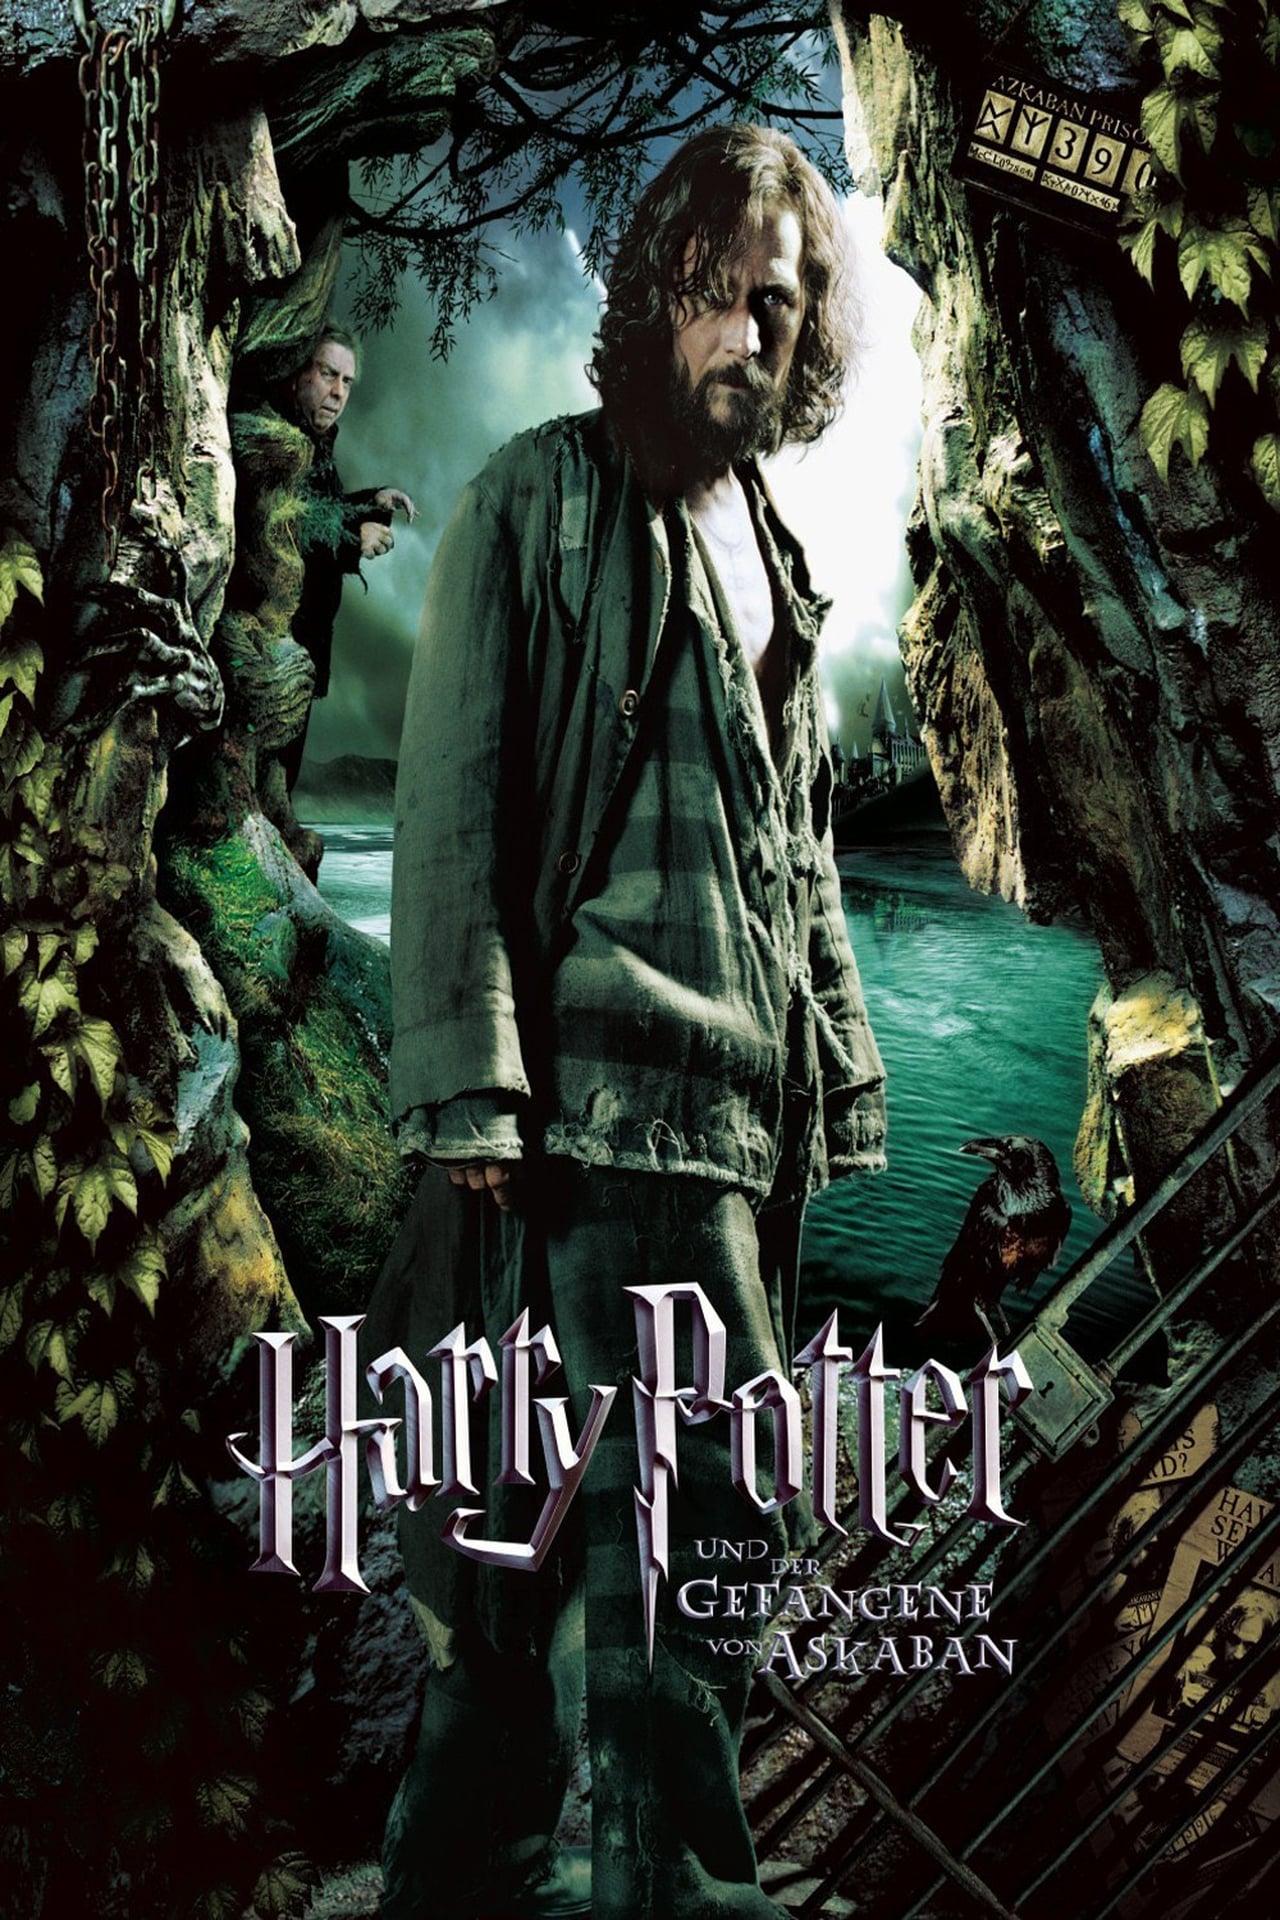 harry potter and the prisoner of azkaban 1080p subtitles